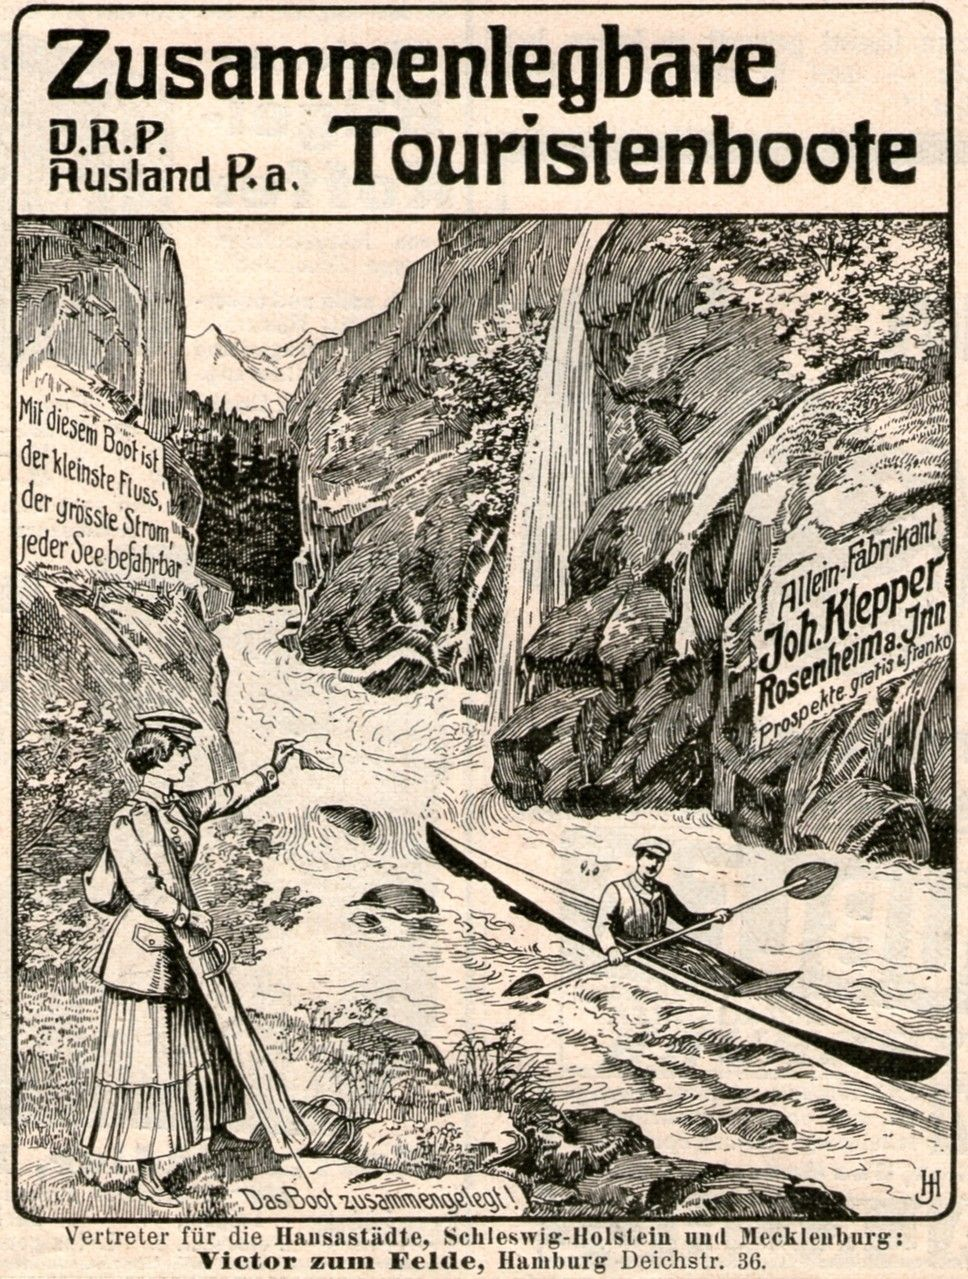 1907 : TOURISTENBOOTE / KLEPPER - ROSENHEIM